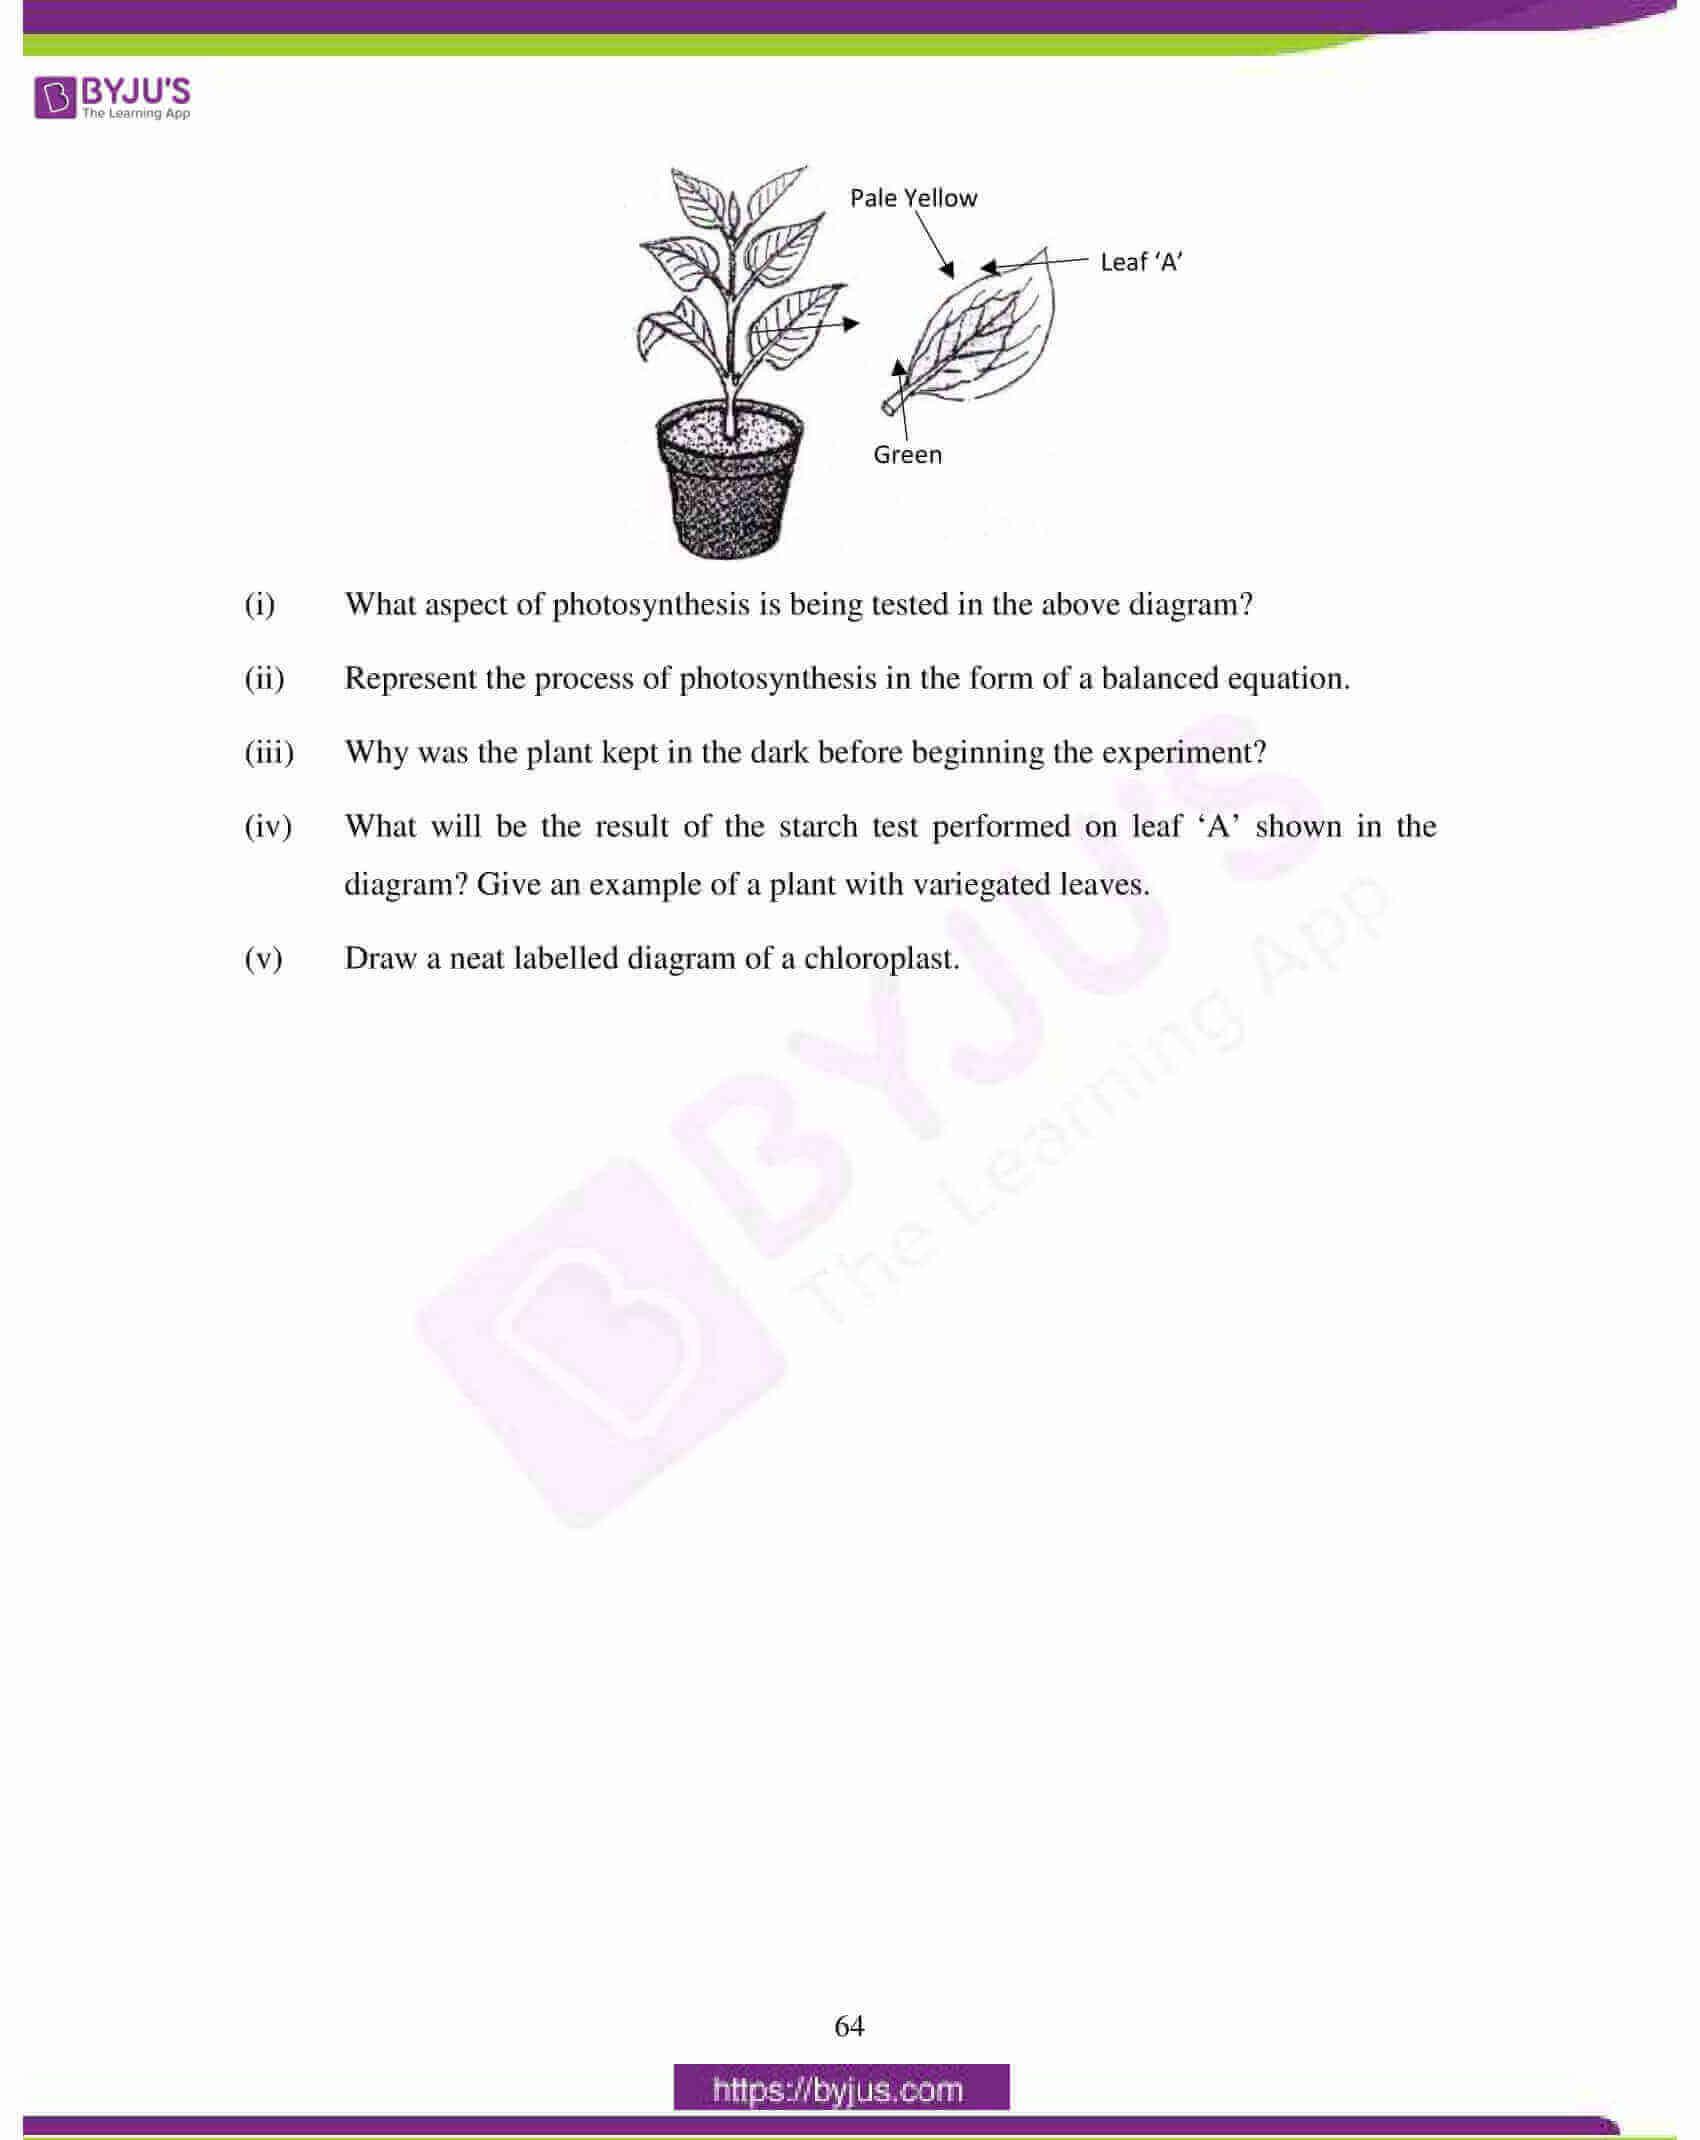 icse class 10 biology question paper solution 2018 11